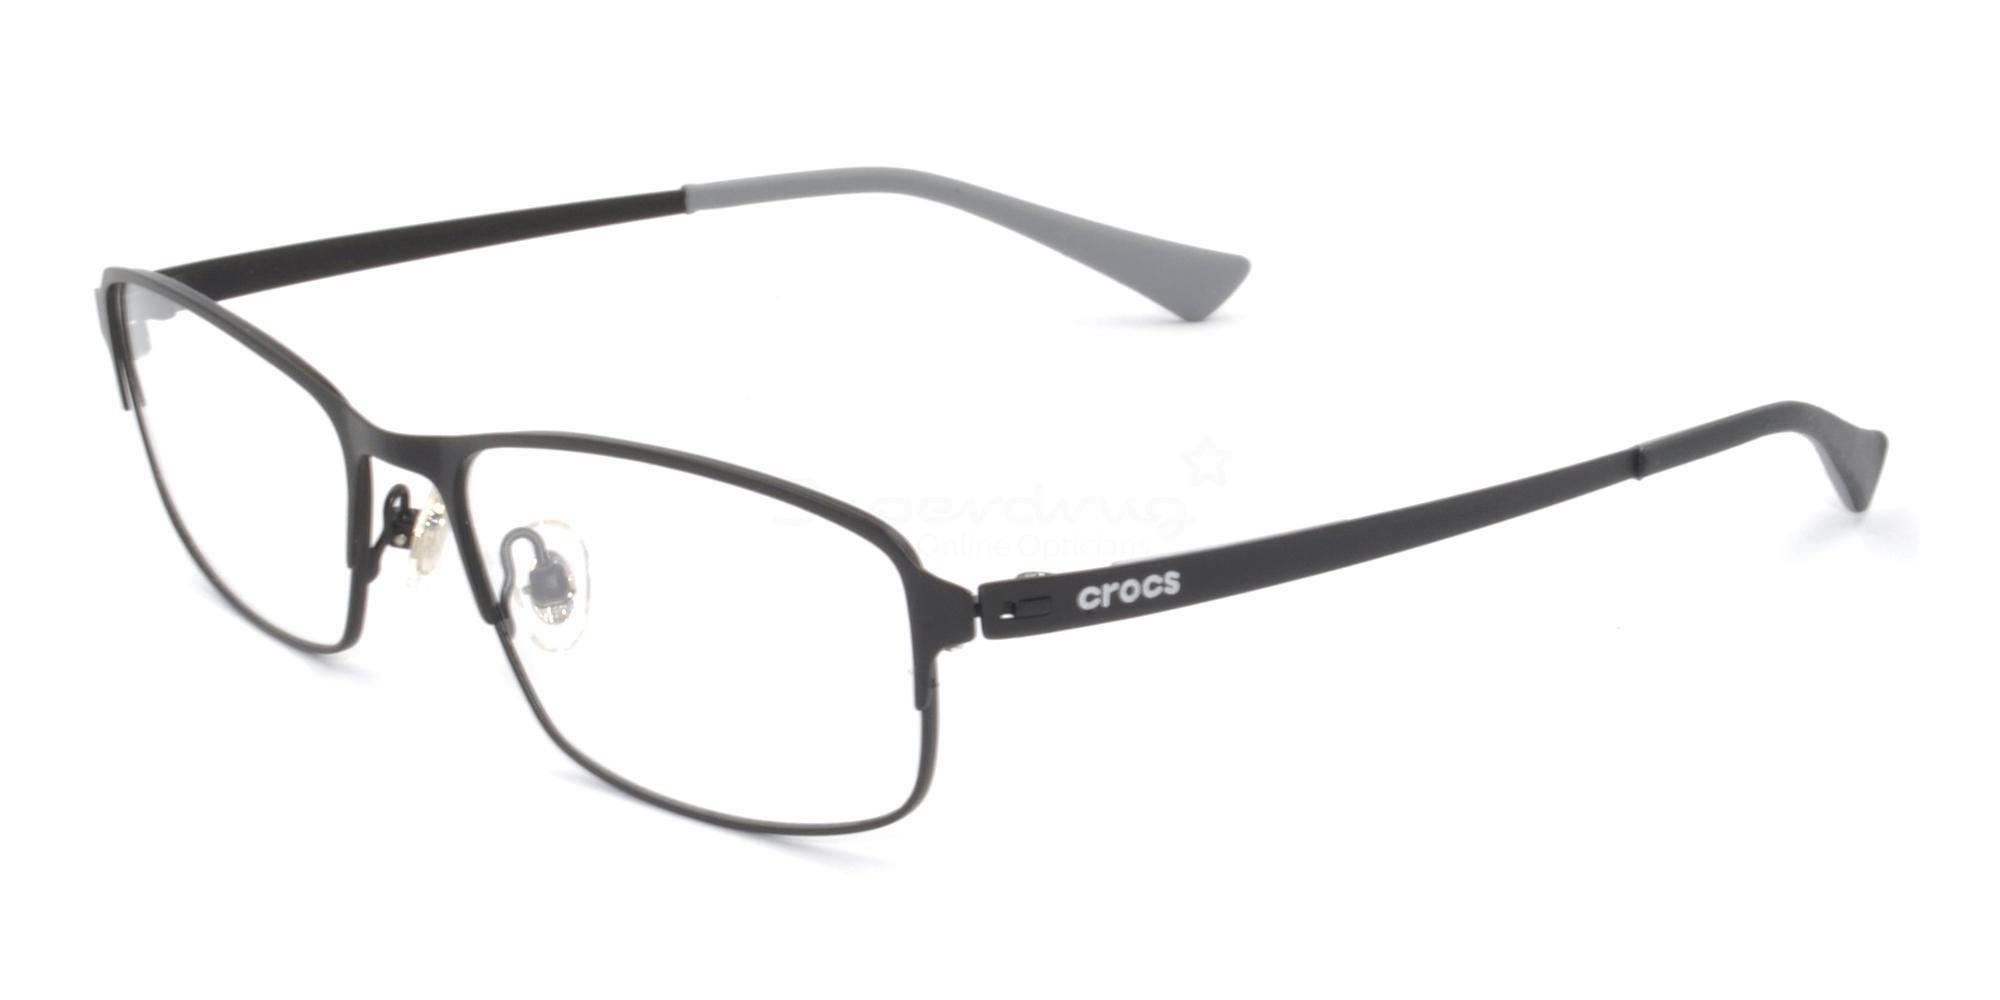 20BK CF4309 Glasses, Crocs Eyewear